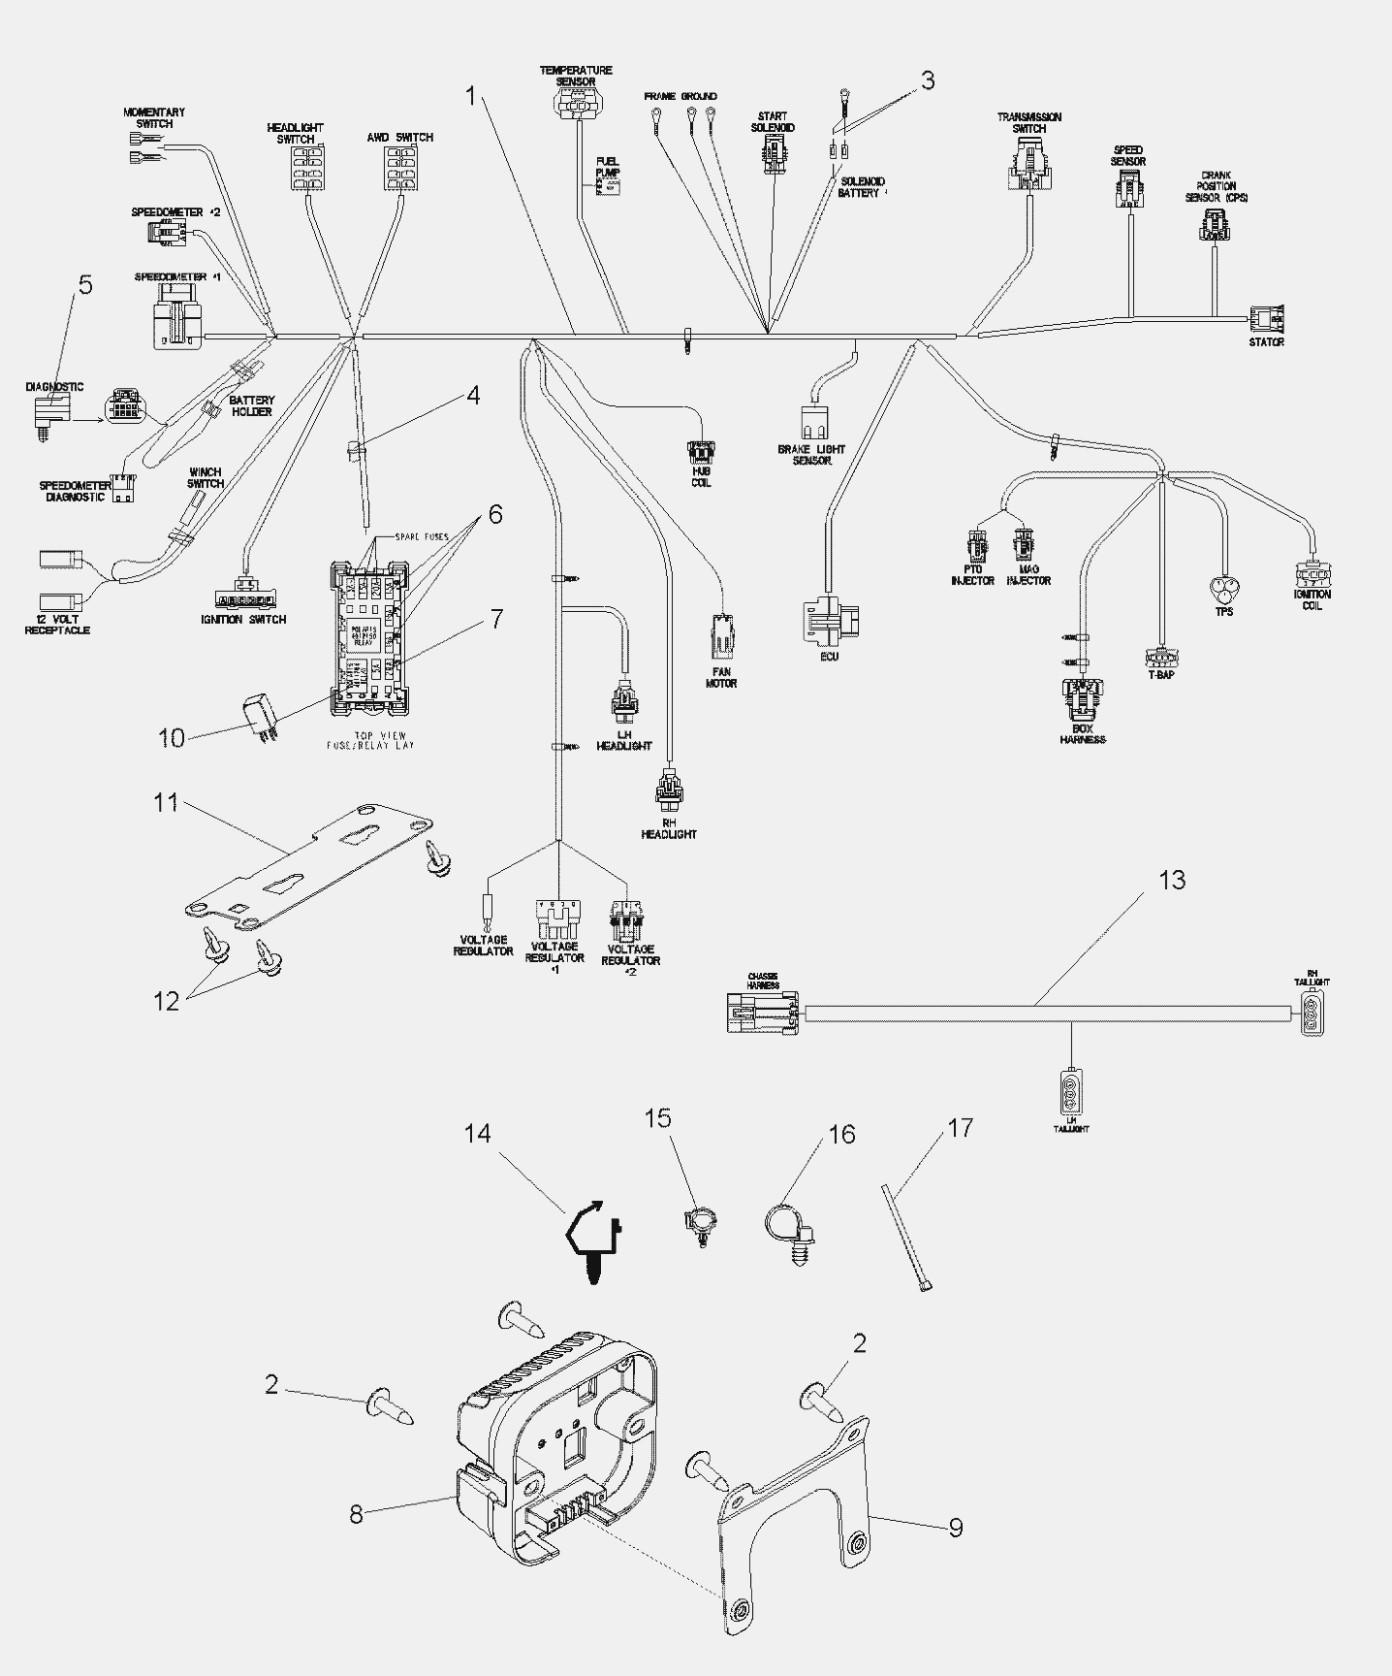 Schema electrique polaris rzr 800 - bois-eco-concept.fr